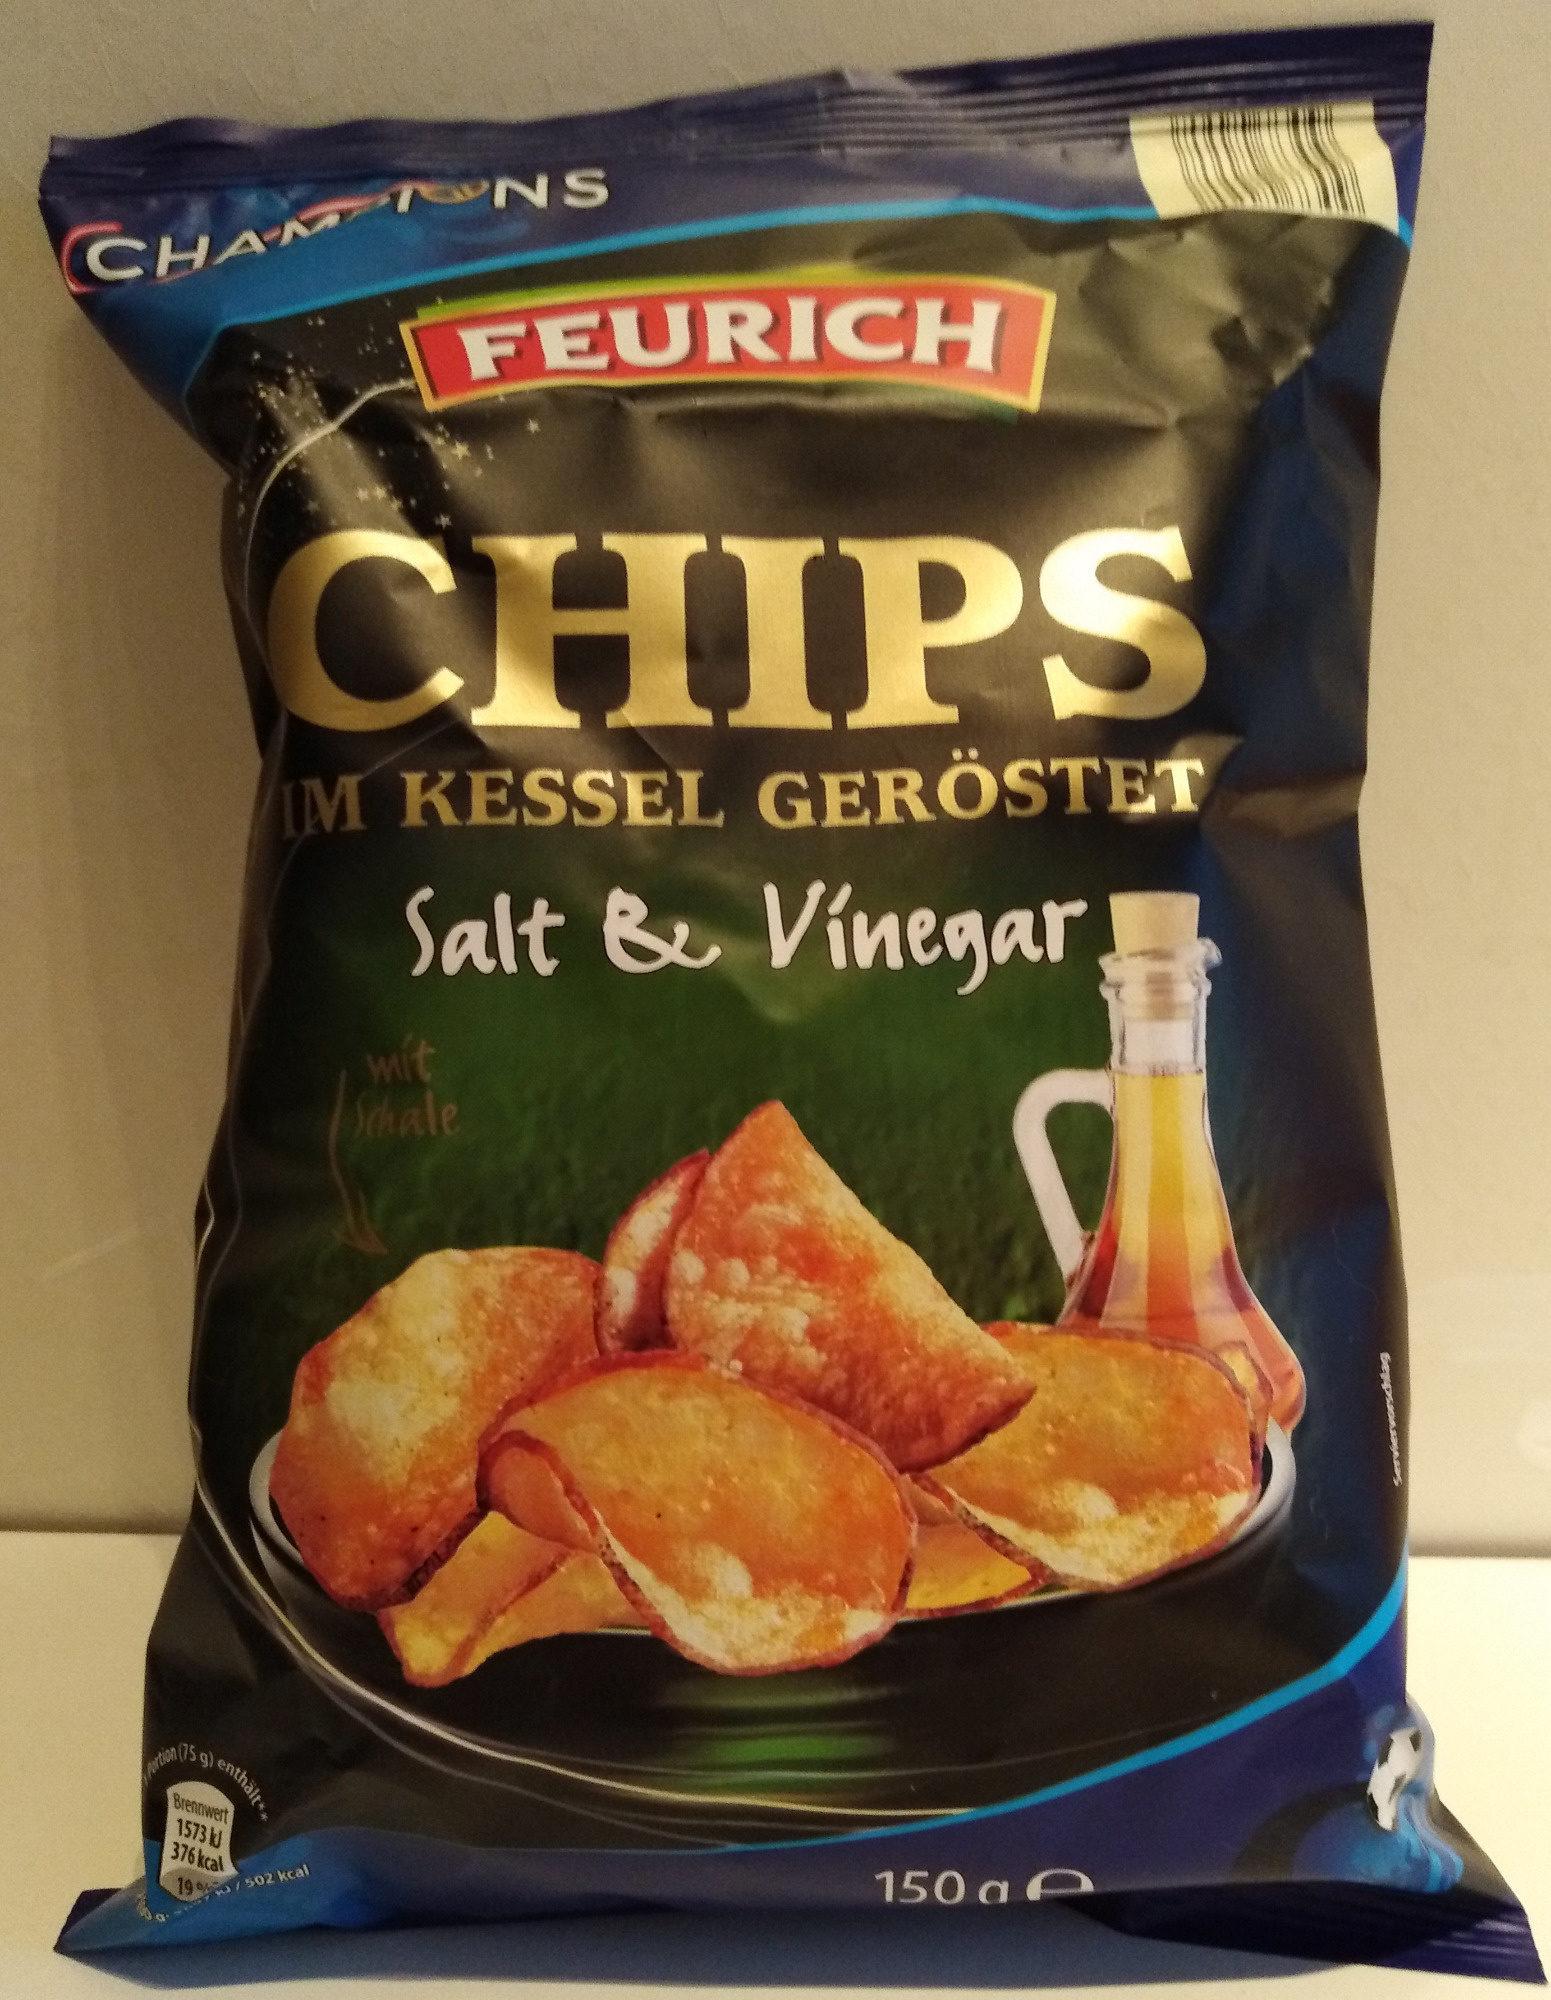 Chips im Kessel geröstet (Salt & Vinegar) - Product - de